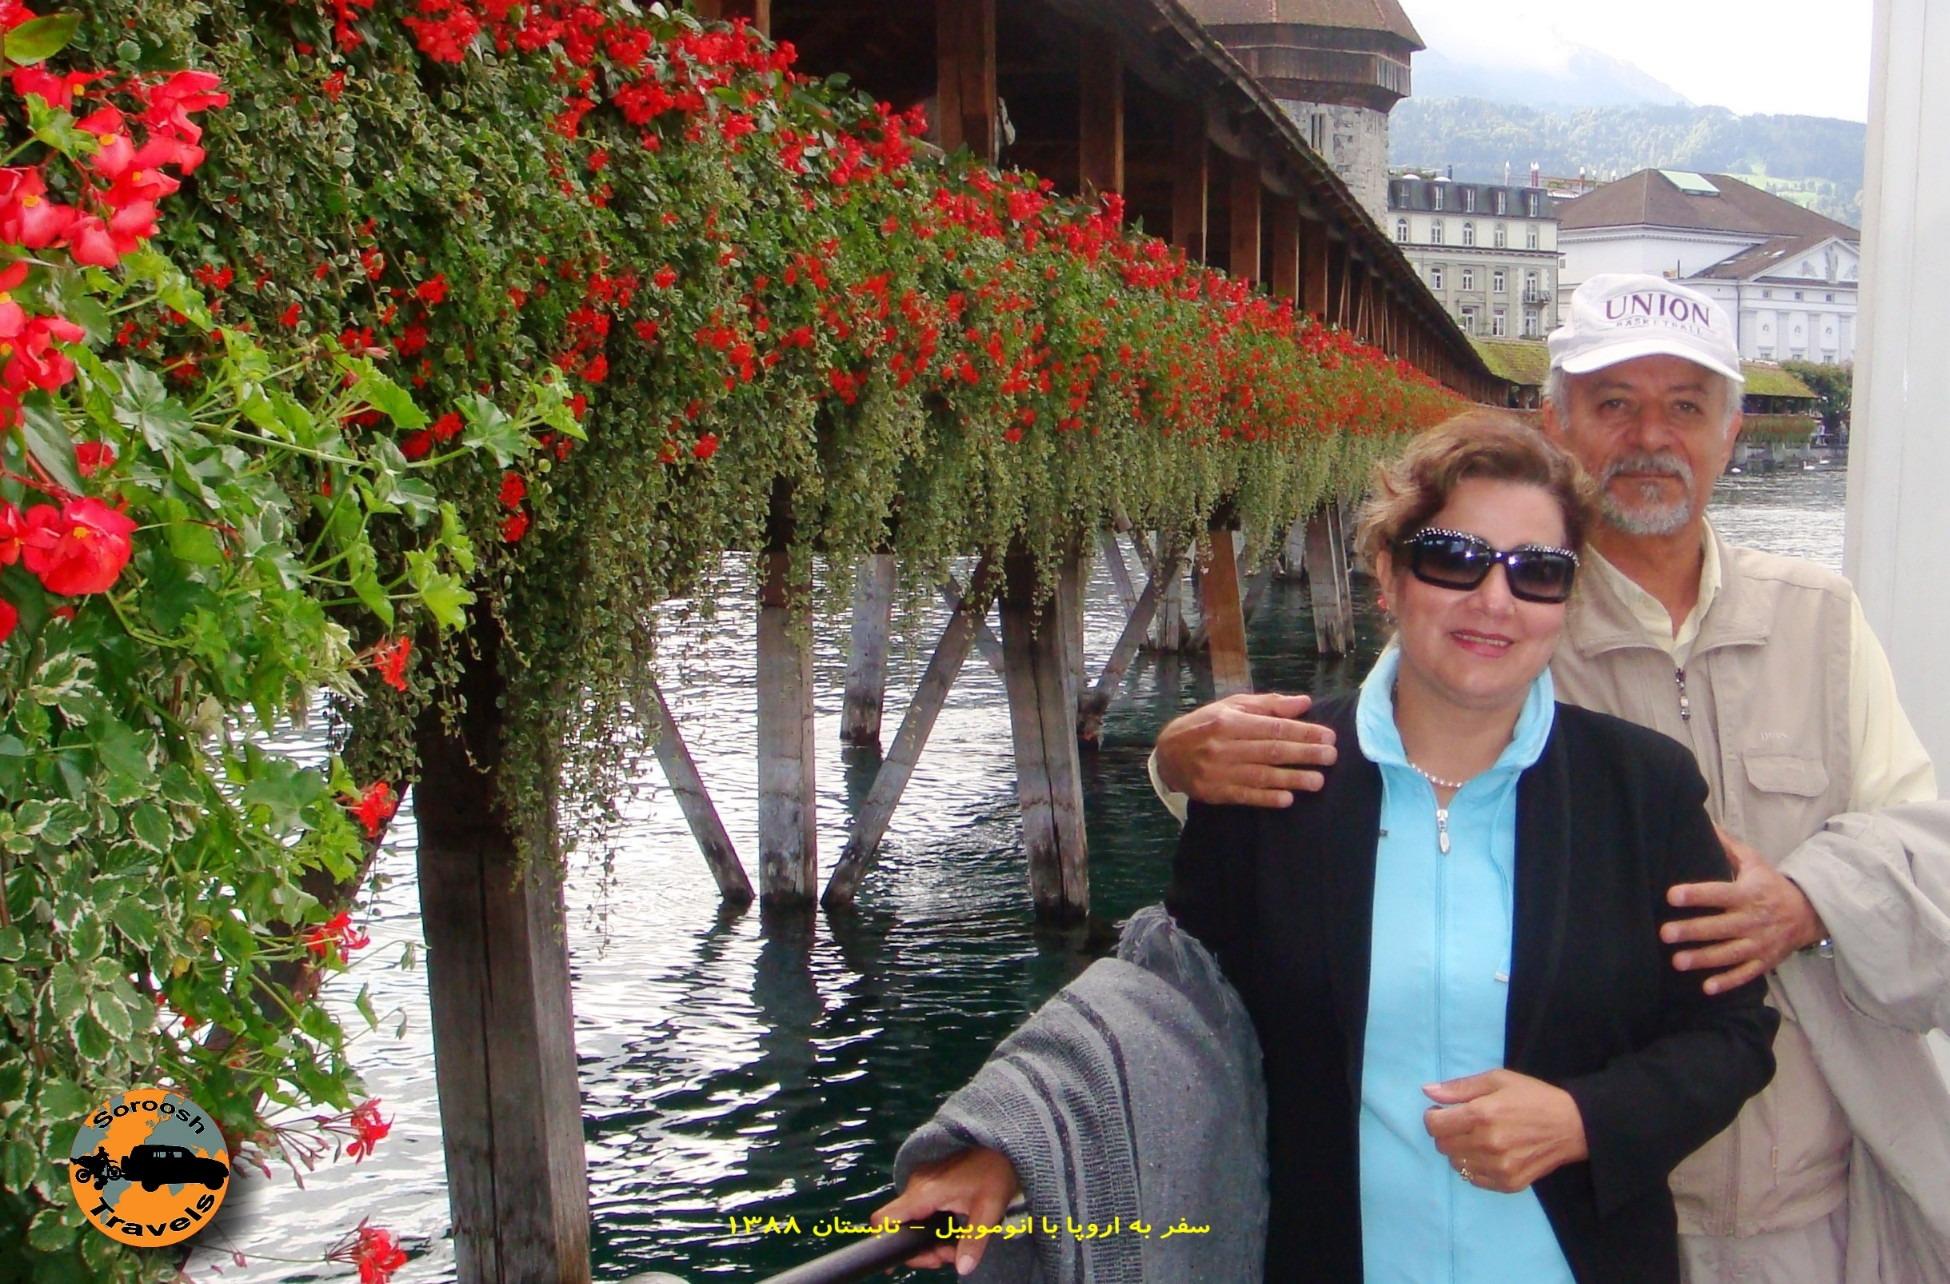 ۱۴ شهریور ۱۳۸۸ – شهر لوسرن – سوئیس